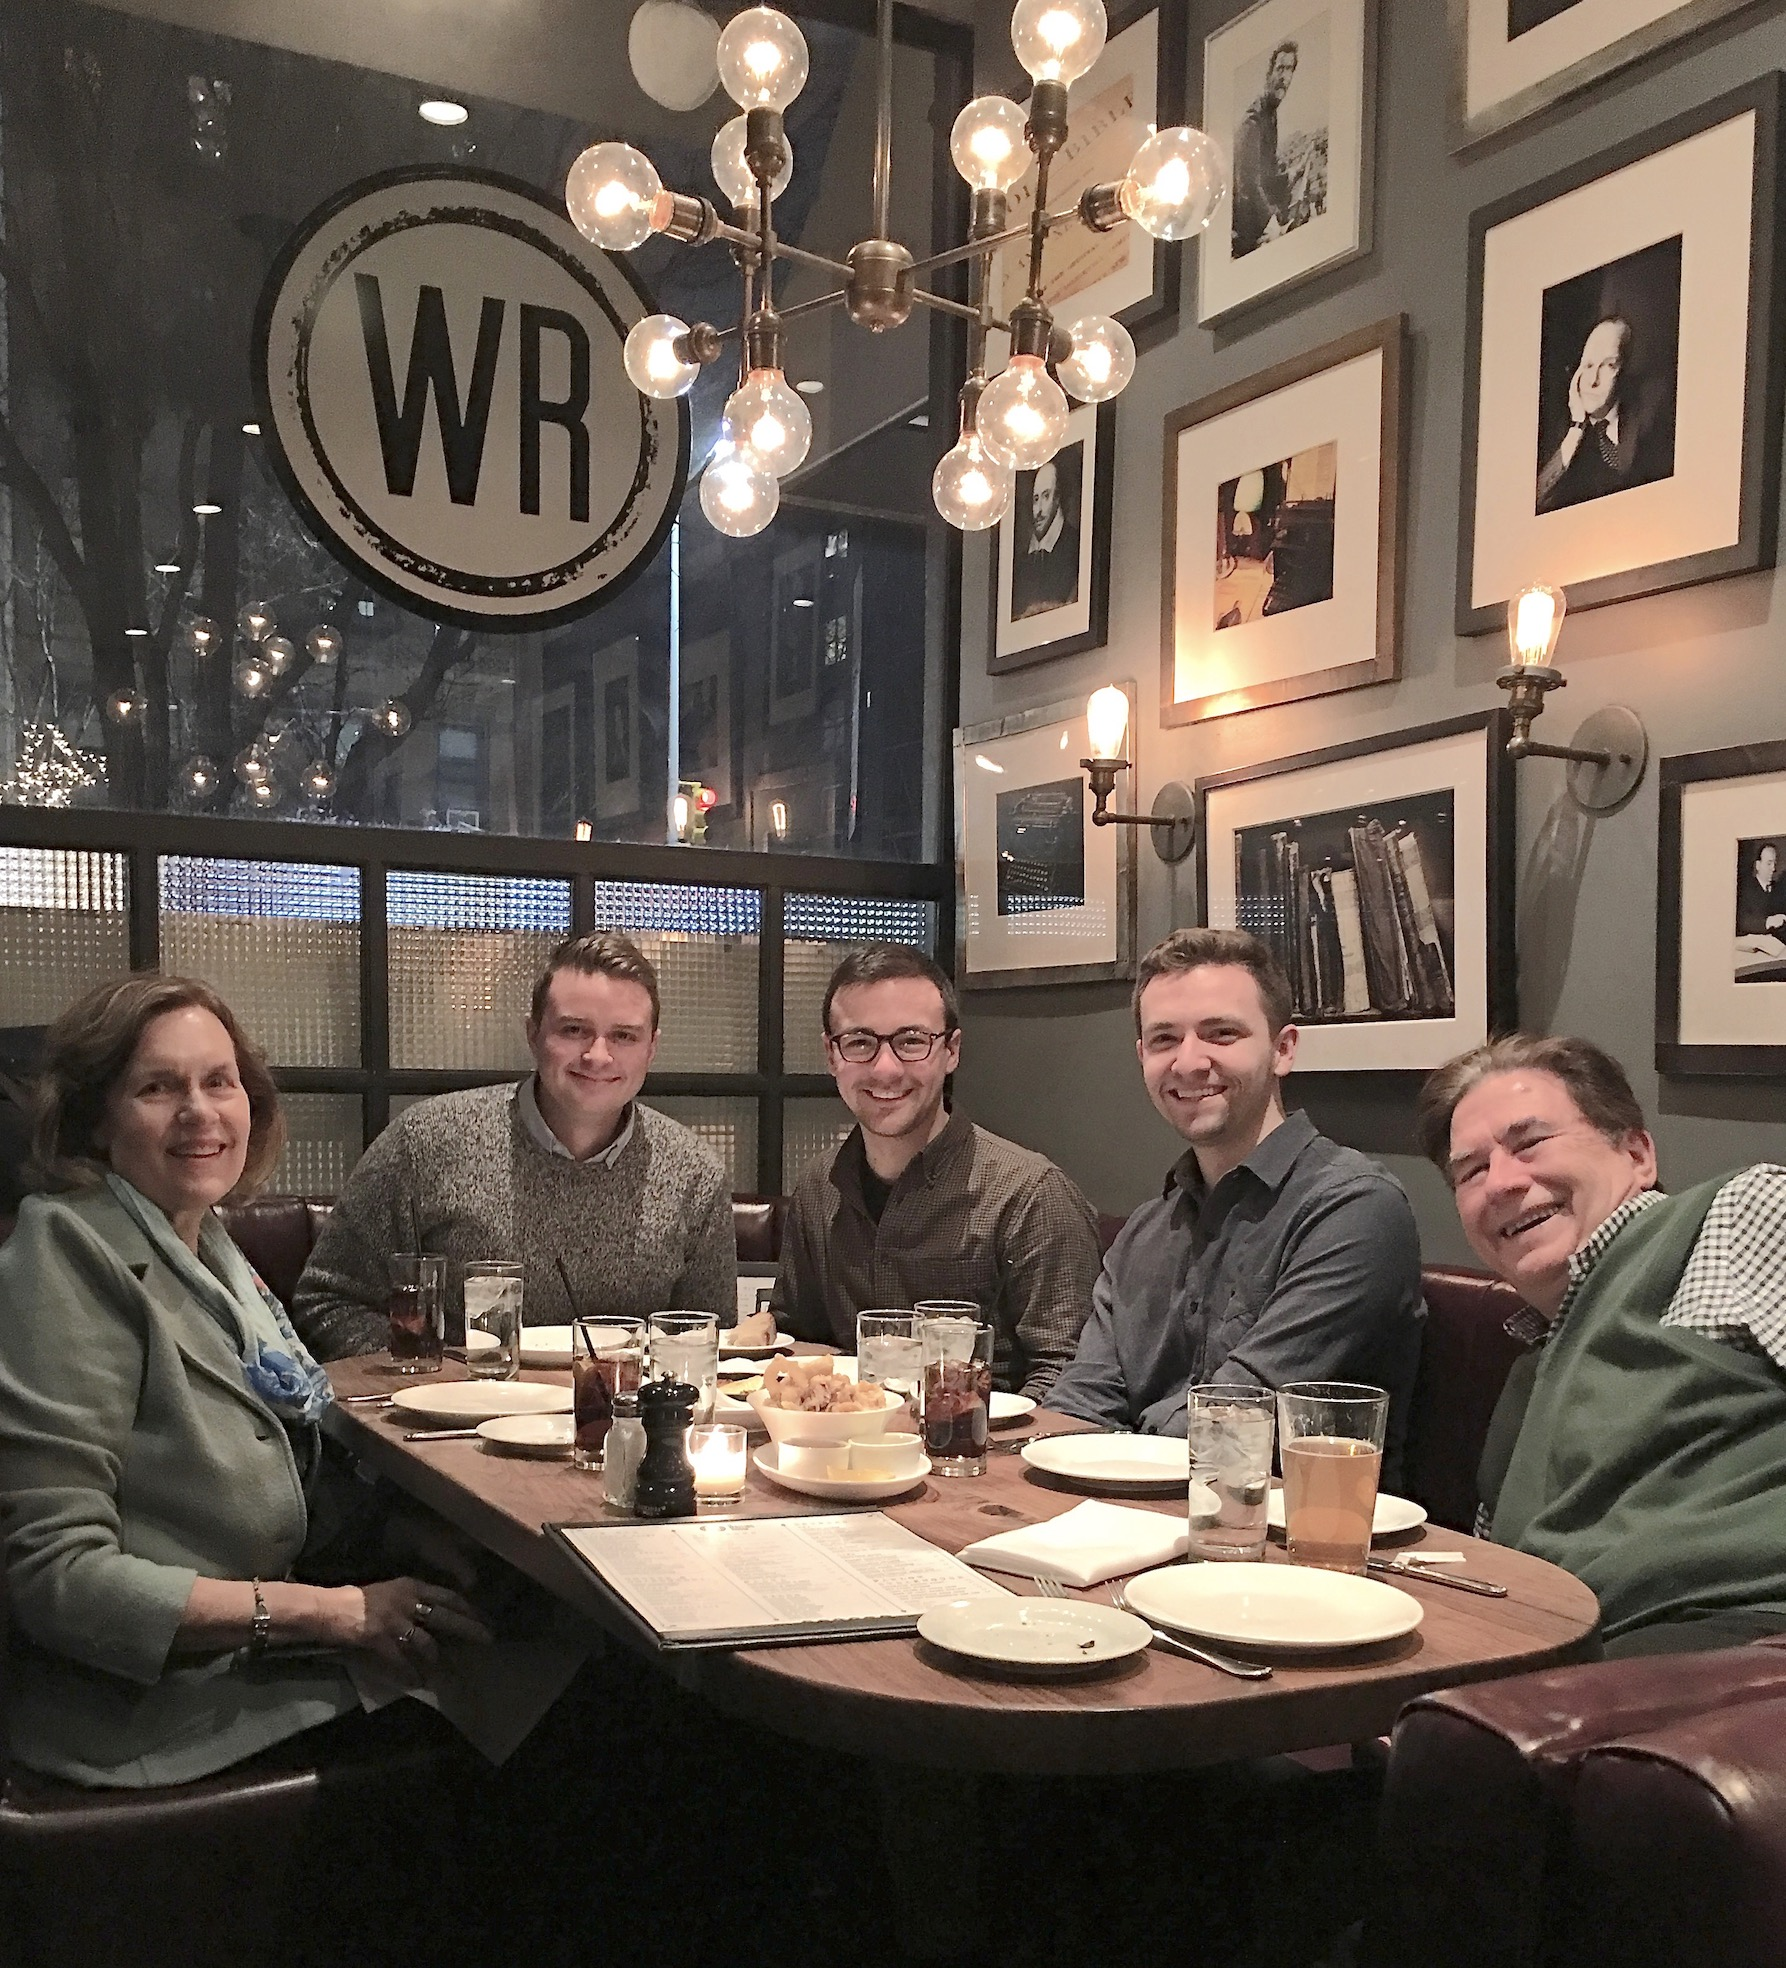 Lorraine, George, Trevan S. , Collin, & John at dinner, in Manhattan, Feb., 2019